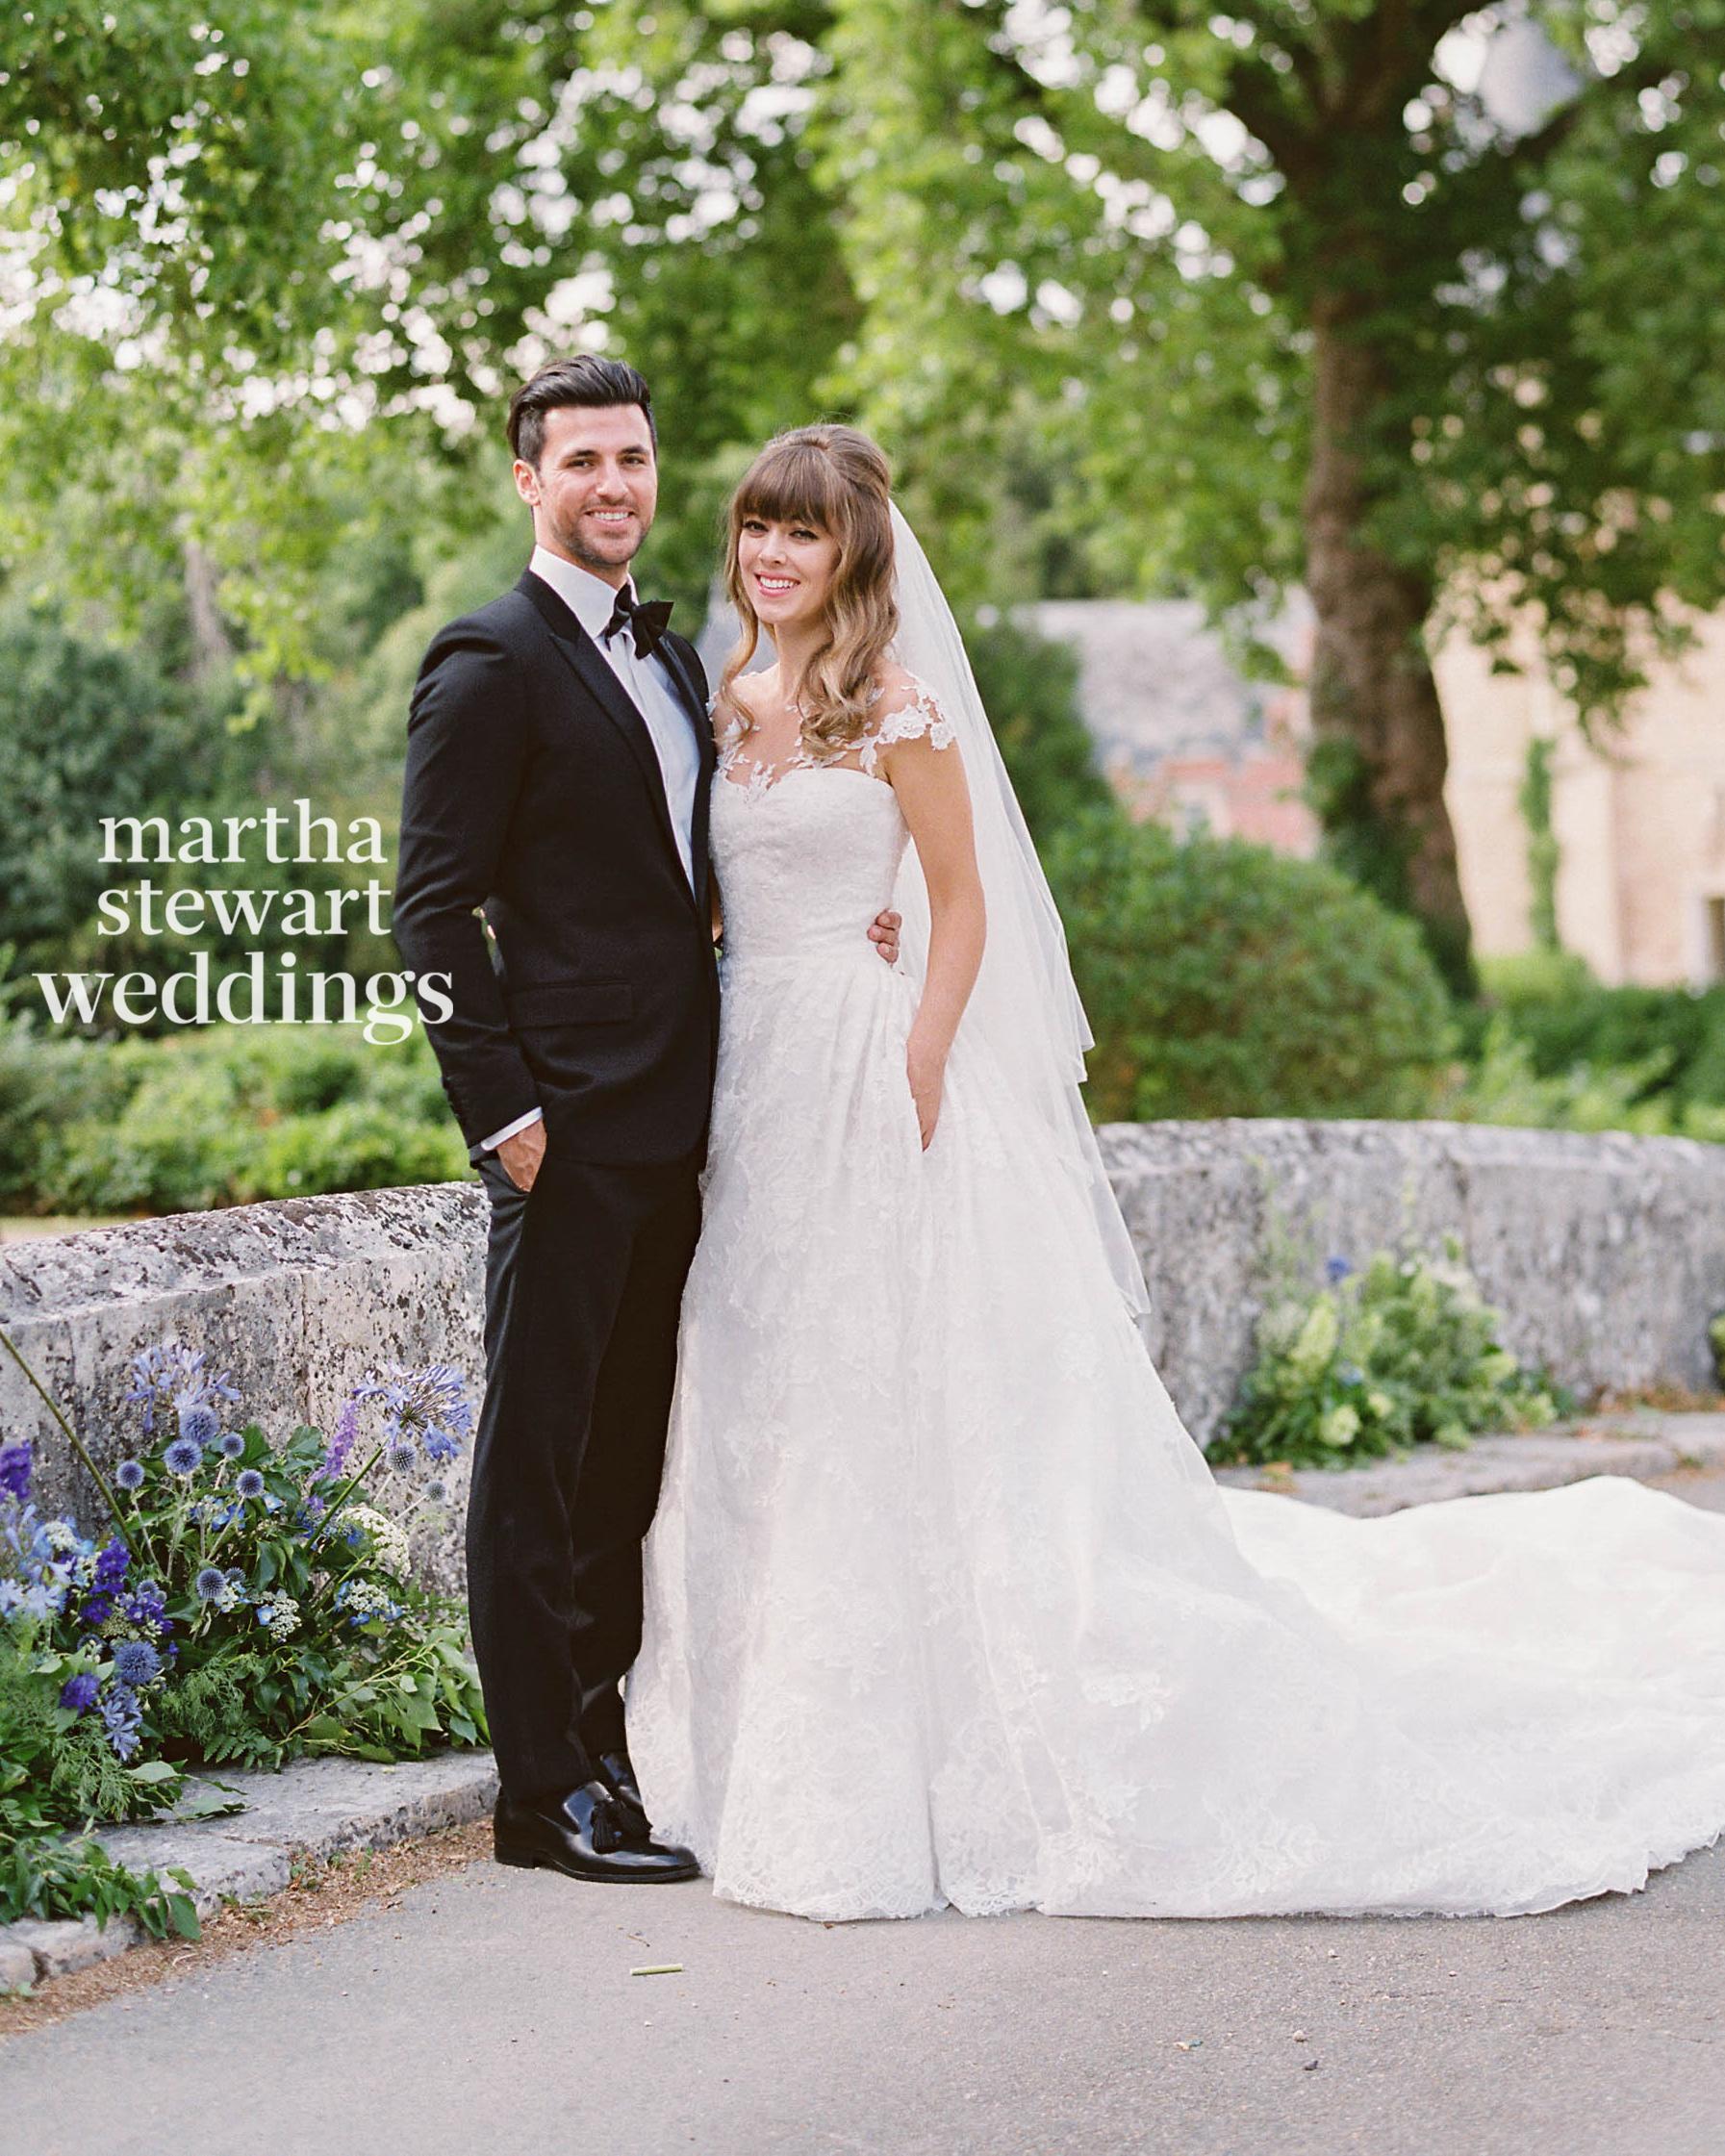 jenny-freddie-wedding-france-603-d112242-watermarked-1215.jpg